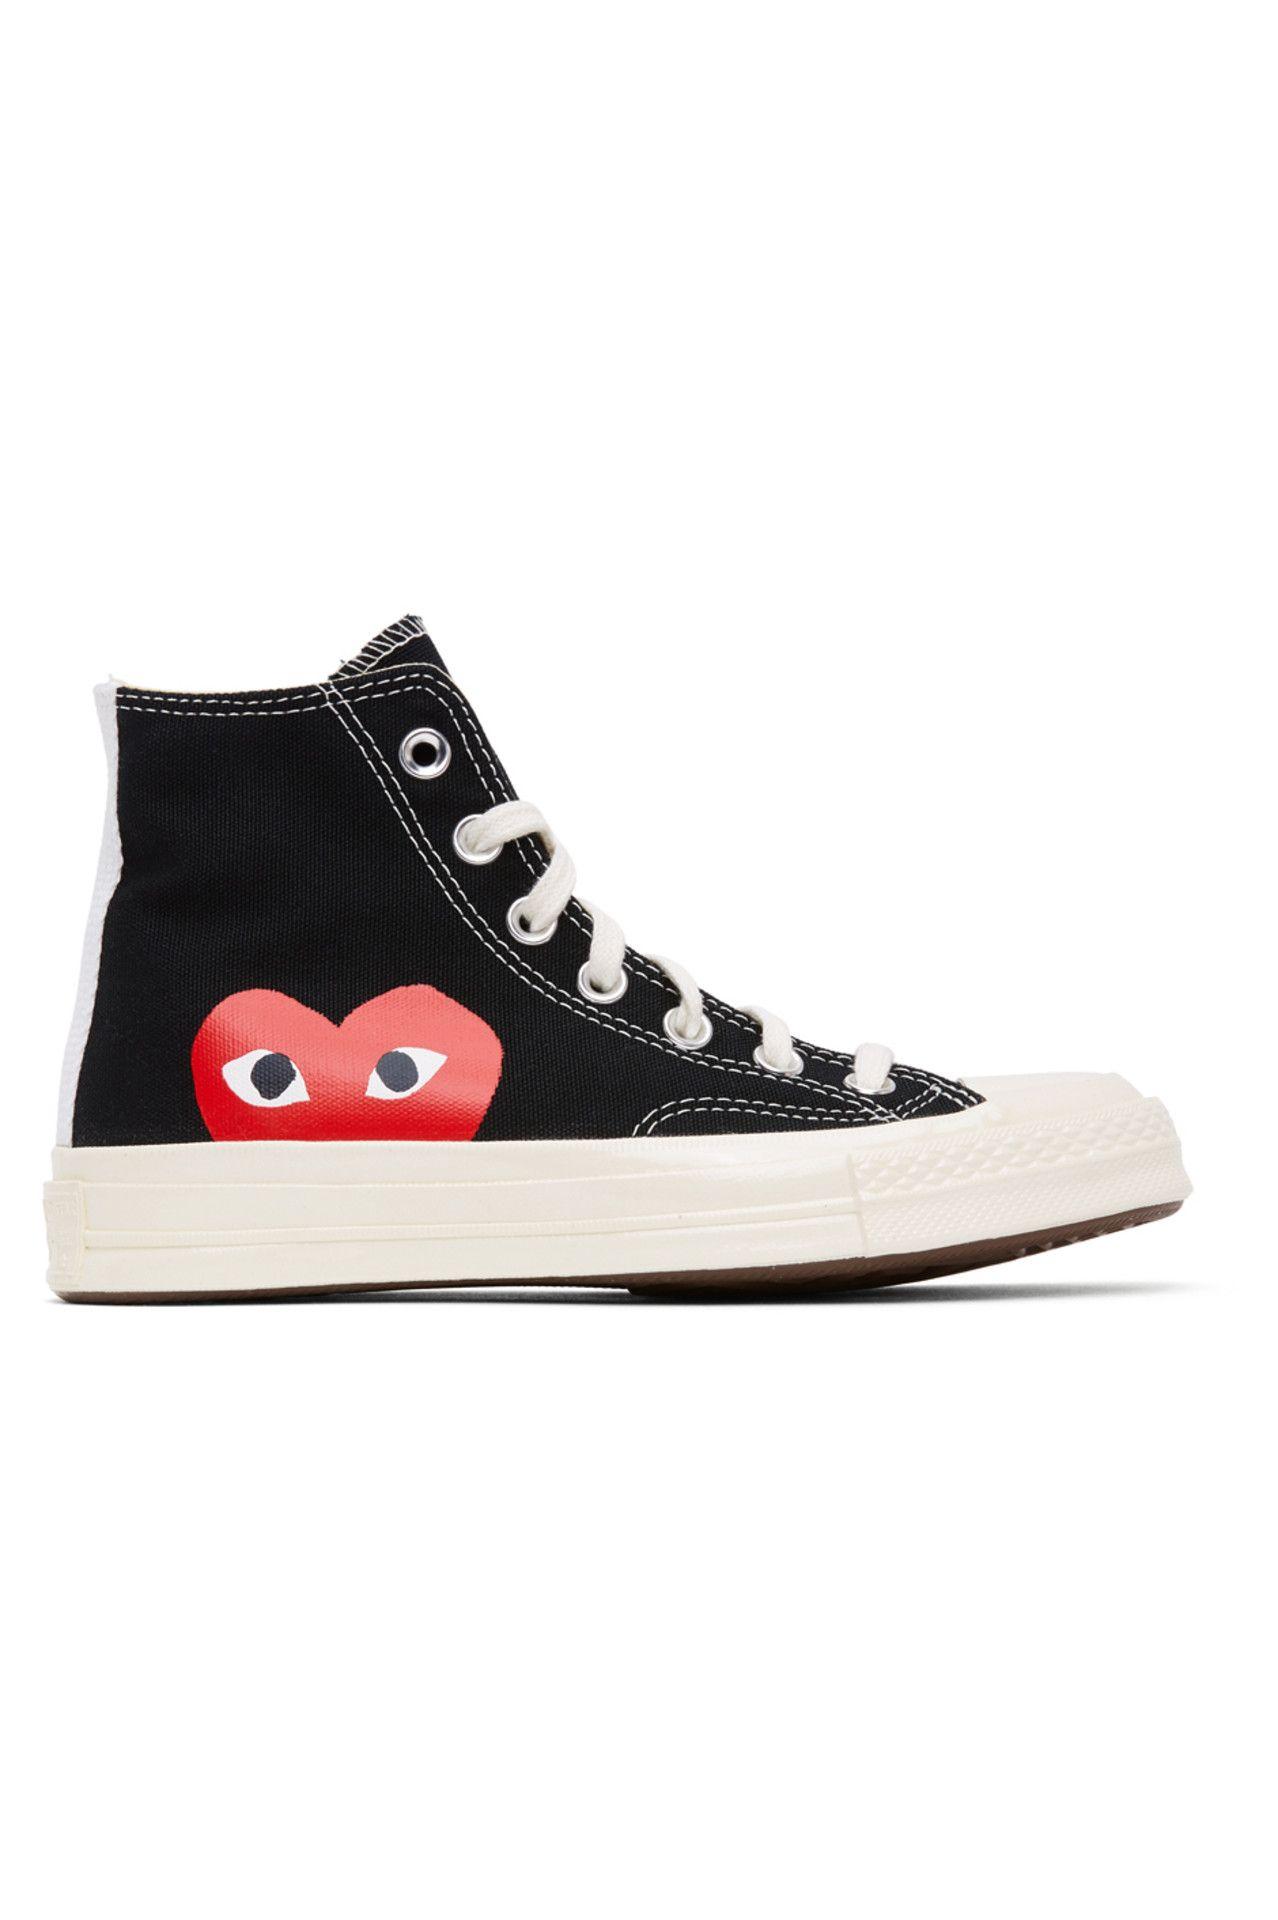 Black Converse Edition Half Heart Chuck